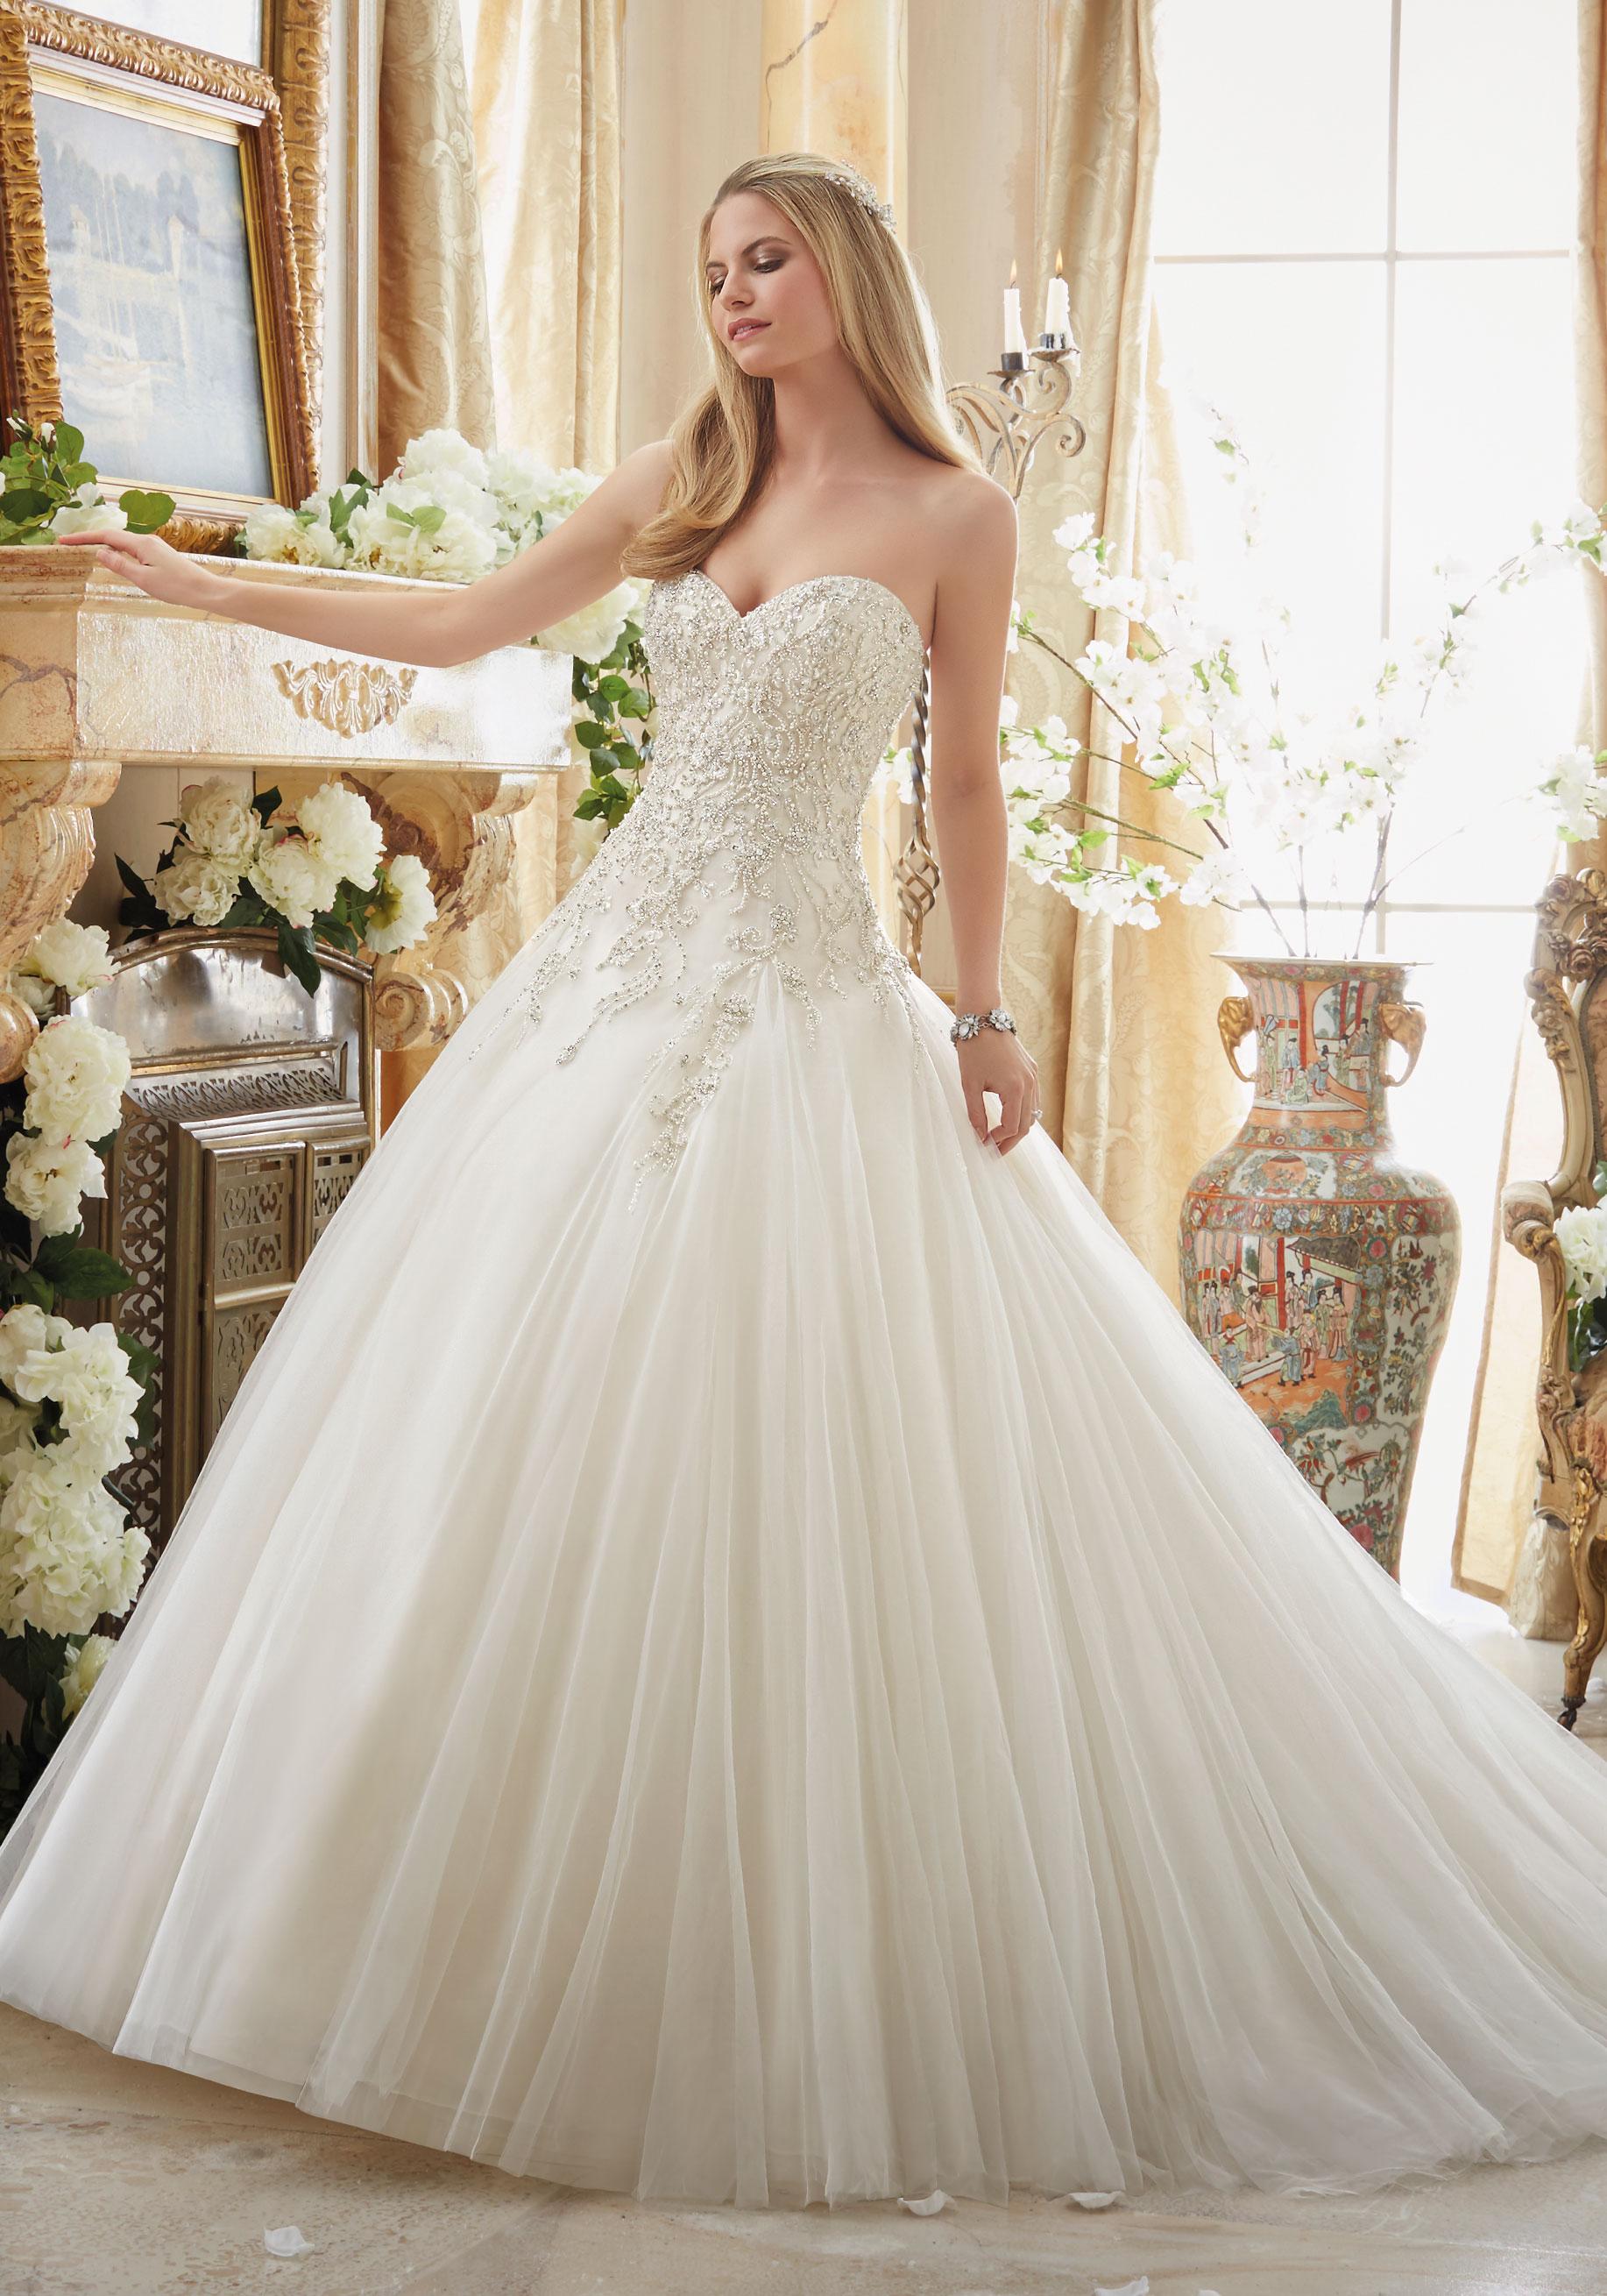 wedding dresses davids bridal photo - 1